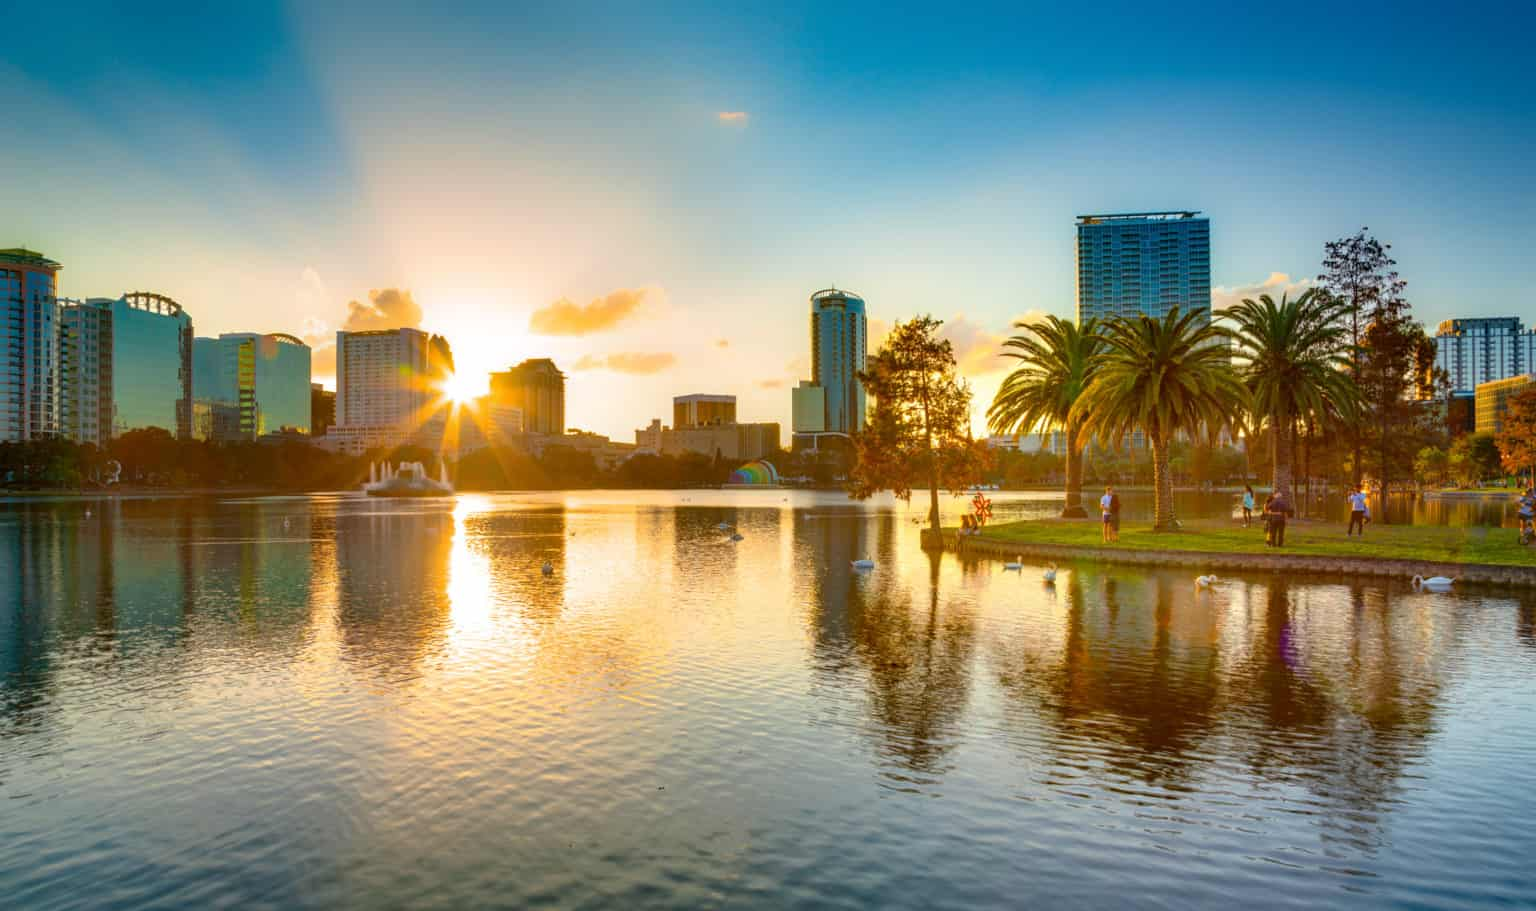 Orlando walking tour